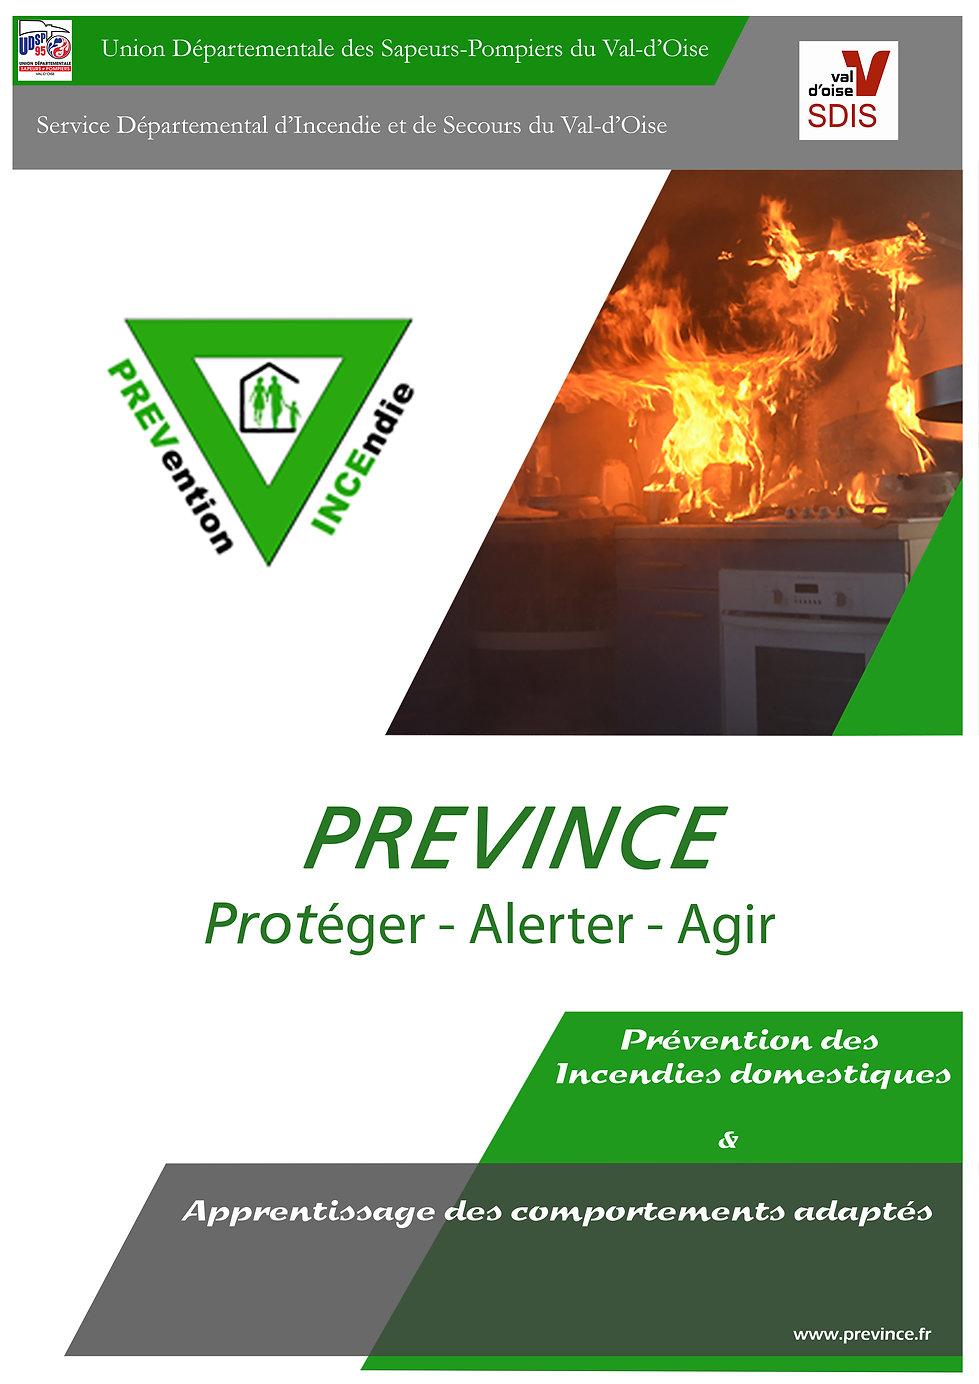 Protéger_Alerter_Agir_2018_PDG.jpg